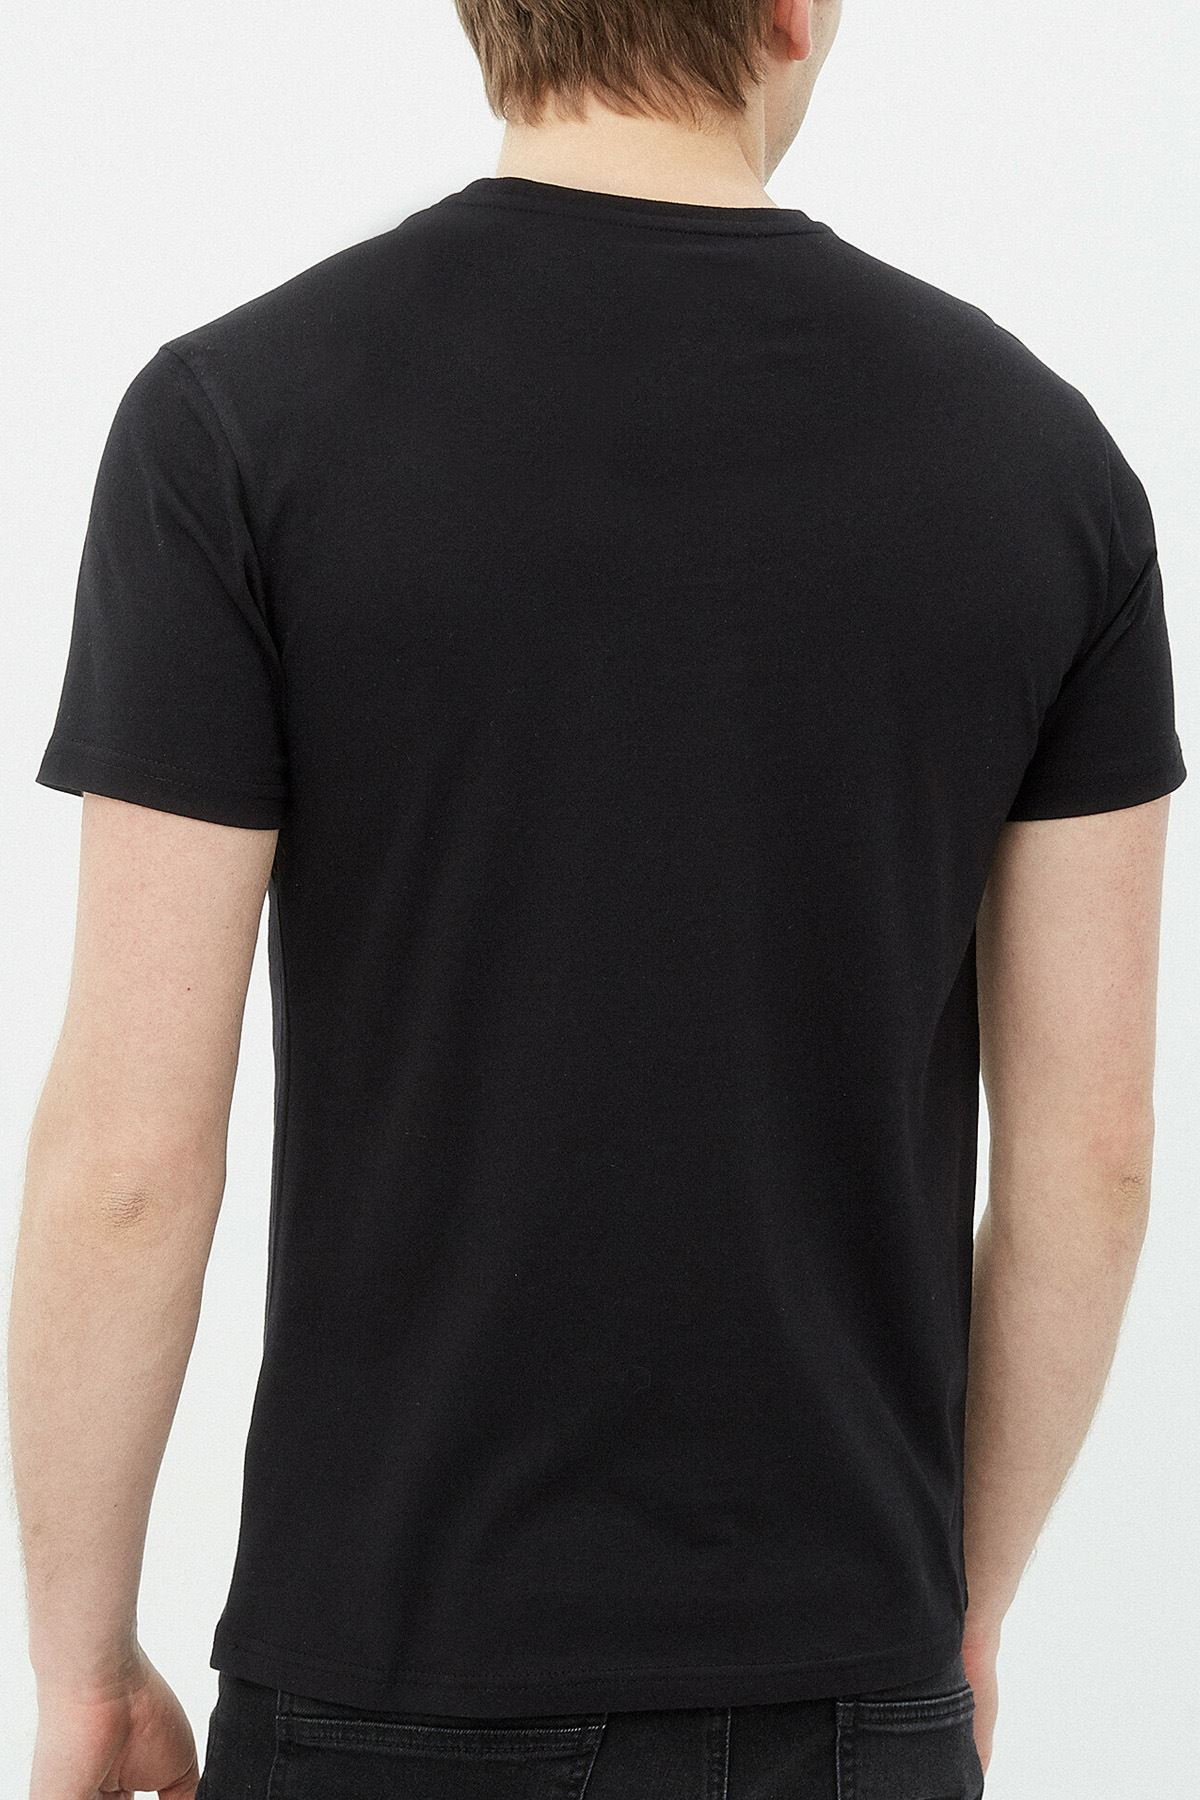 Naruto Anime 01 Siyah Erkek Tshirt - Tişört